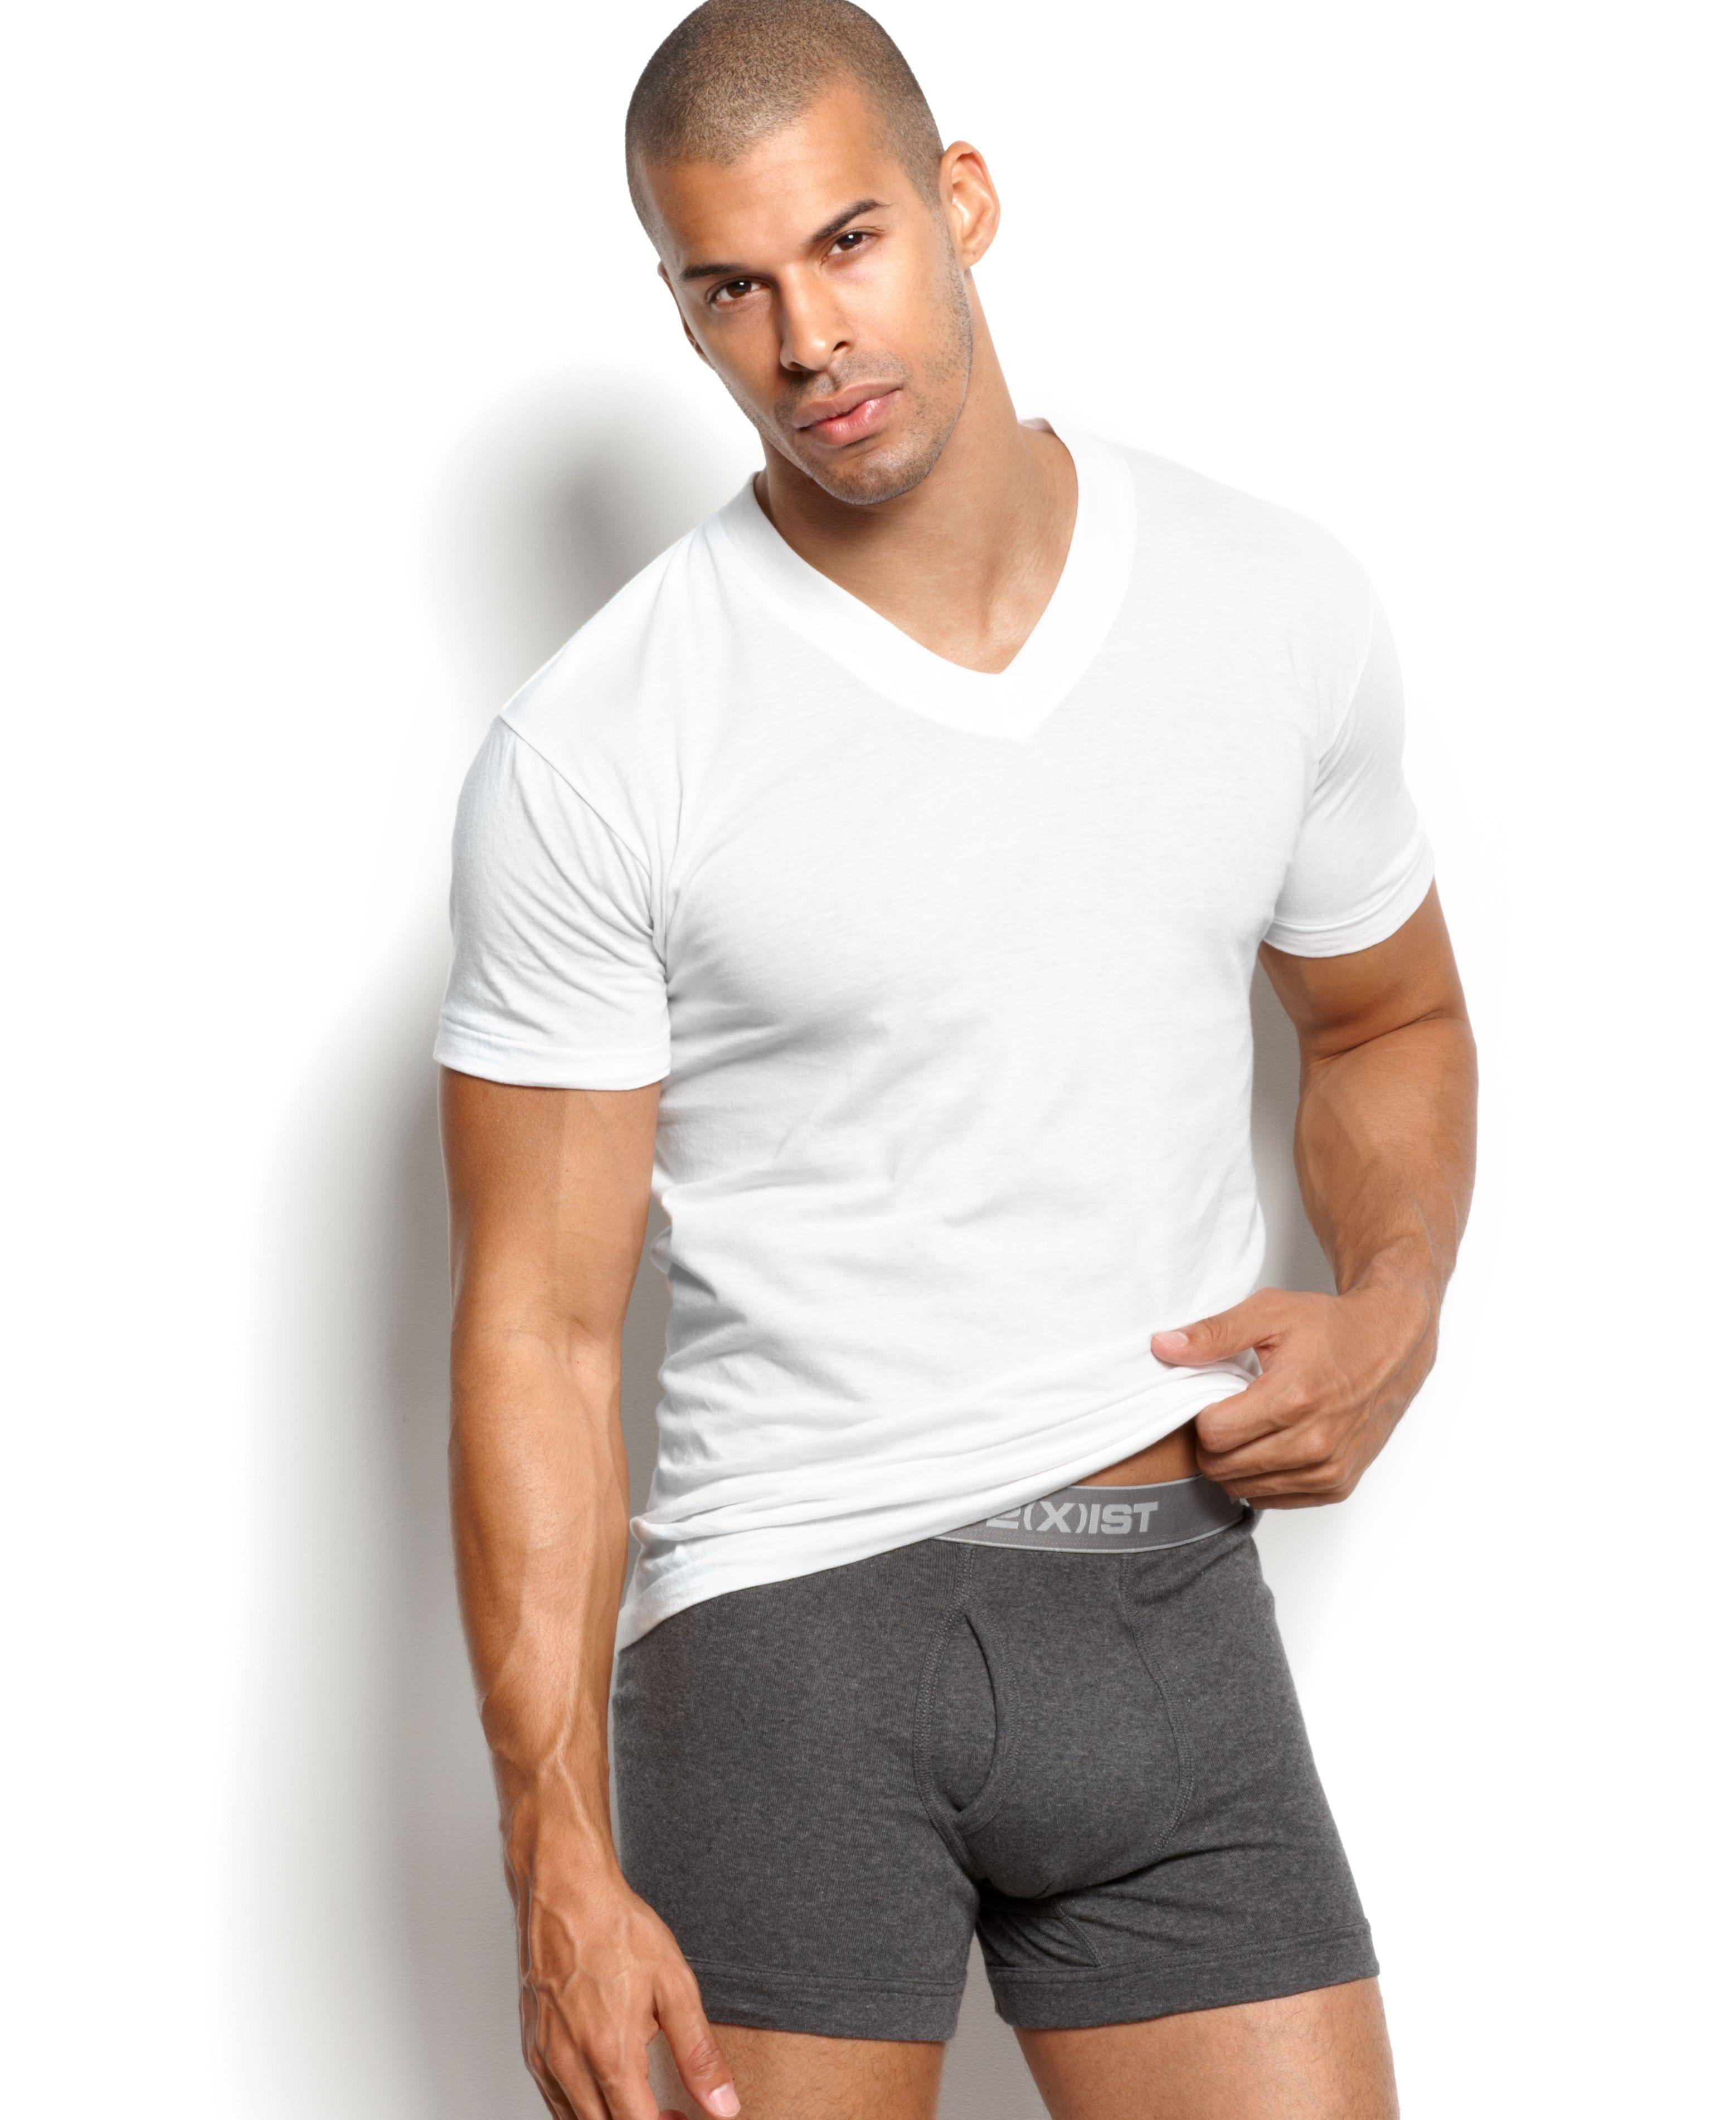 2xist Vivid – slip noir homme – homdiz | ropa interior de caballero |  Pinterest | Hot guys